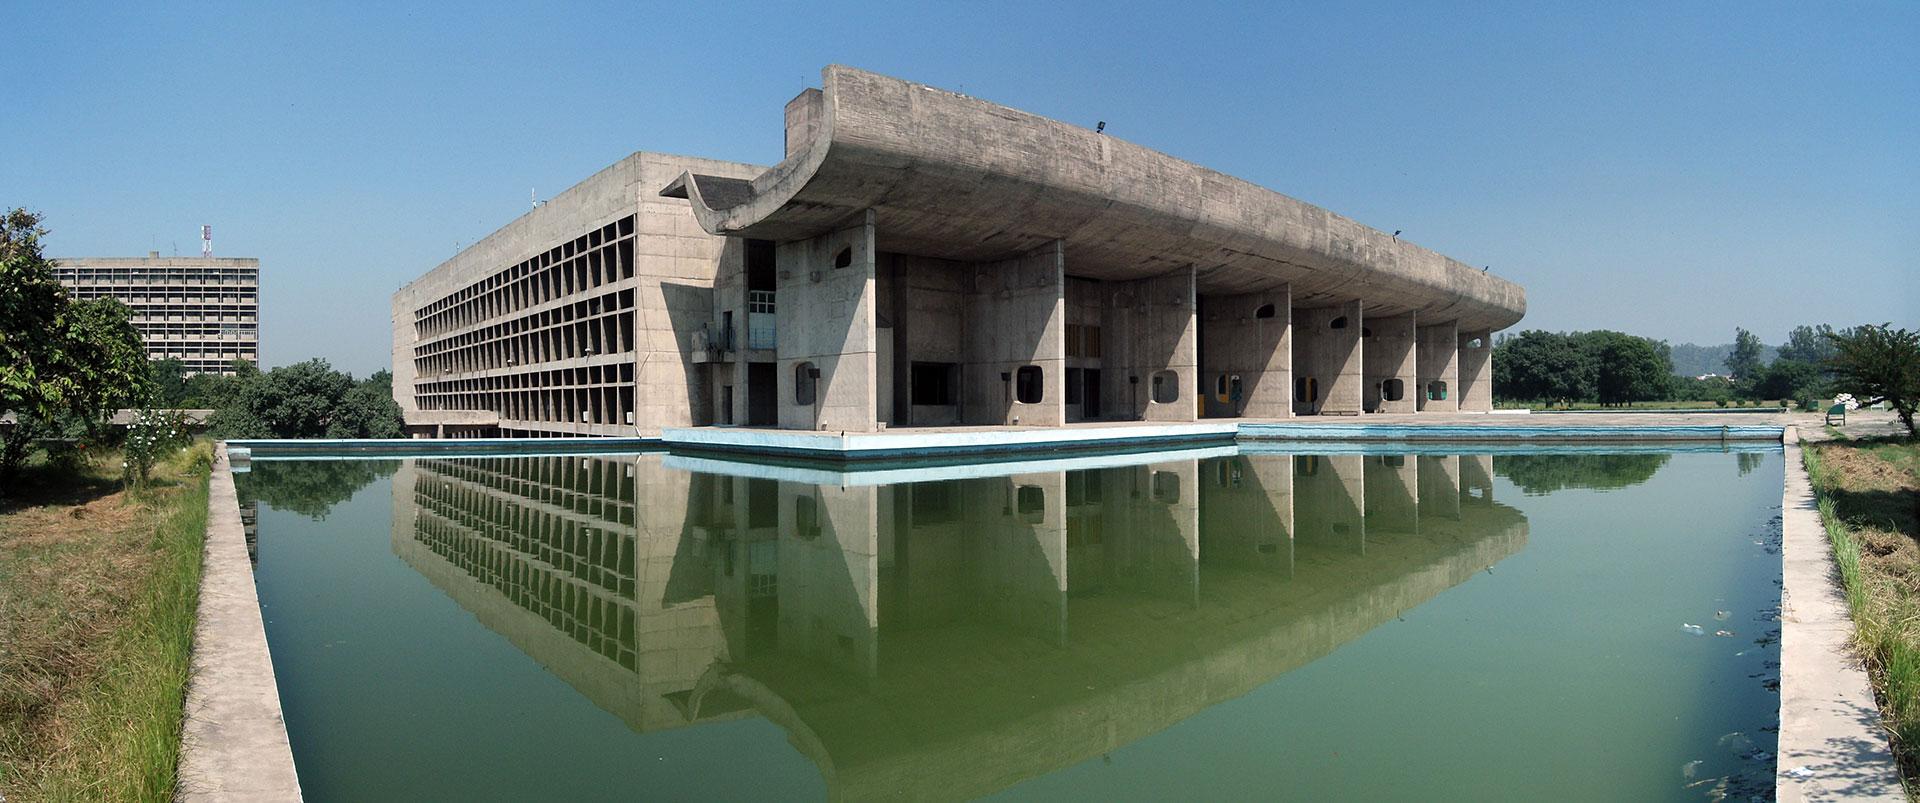 Asamblea de Chandigarh, Le Corbusier.